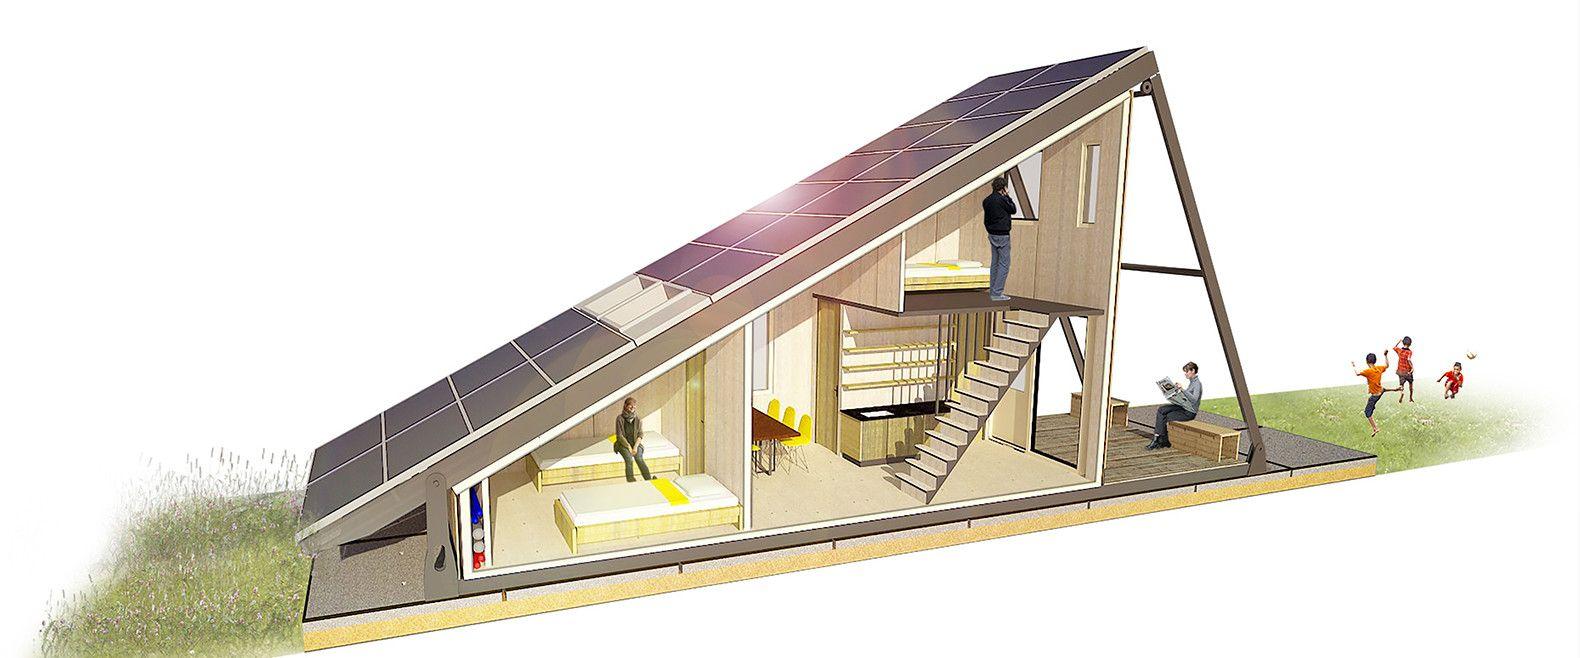 Solar Cabin: modular refugee housing with an energy-generating solar ...